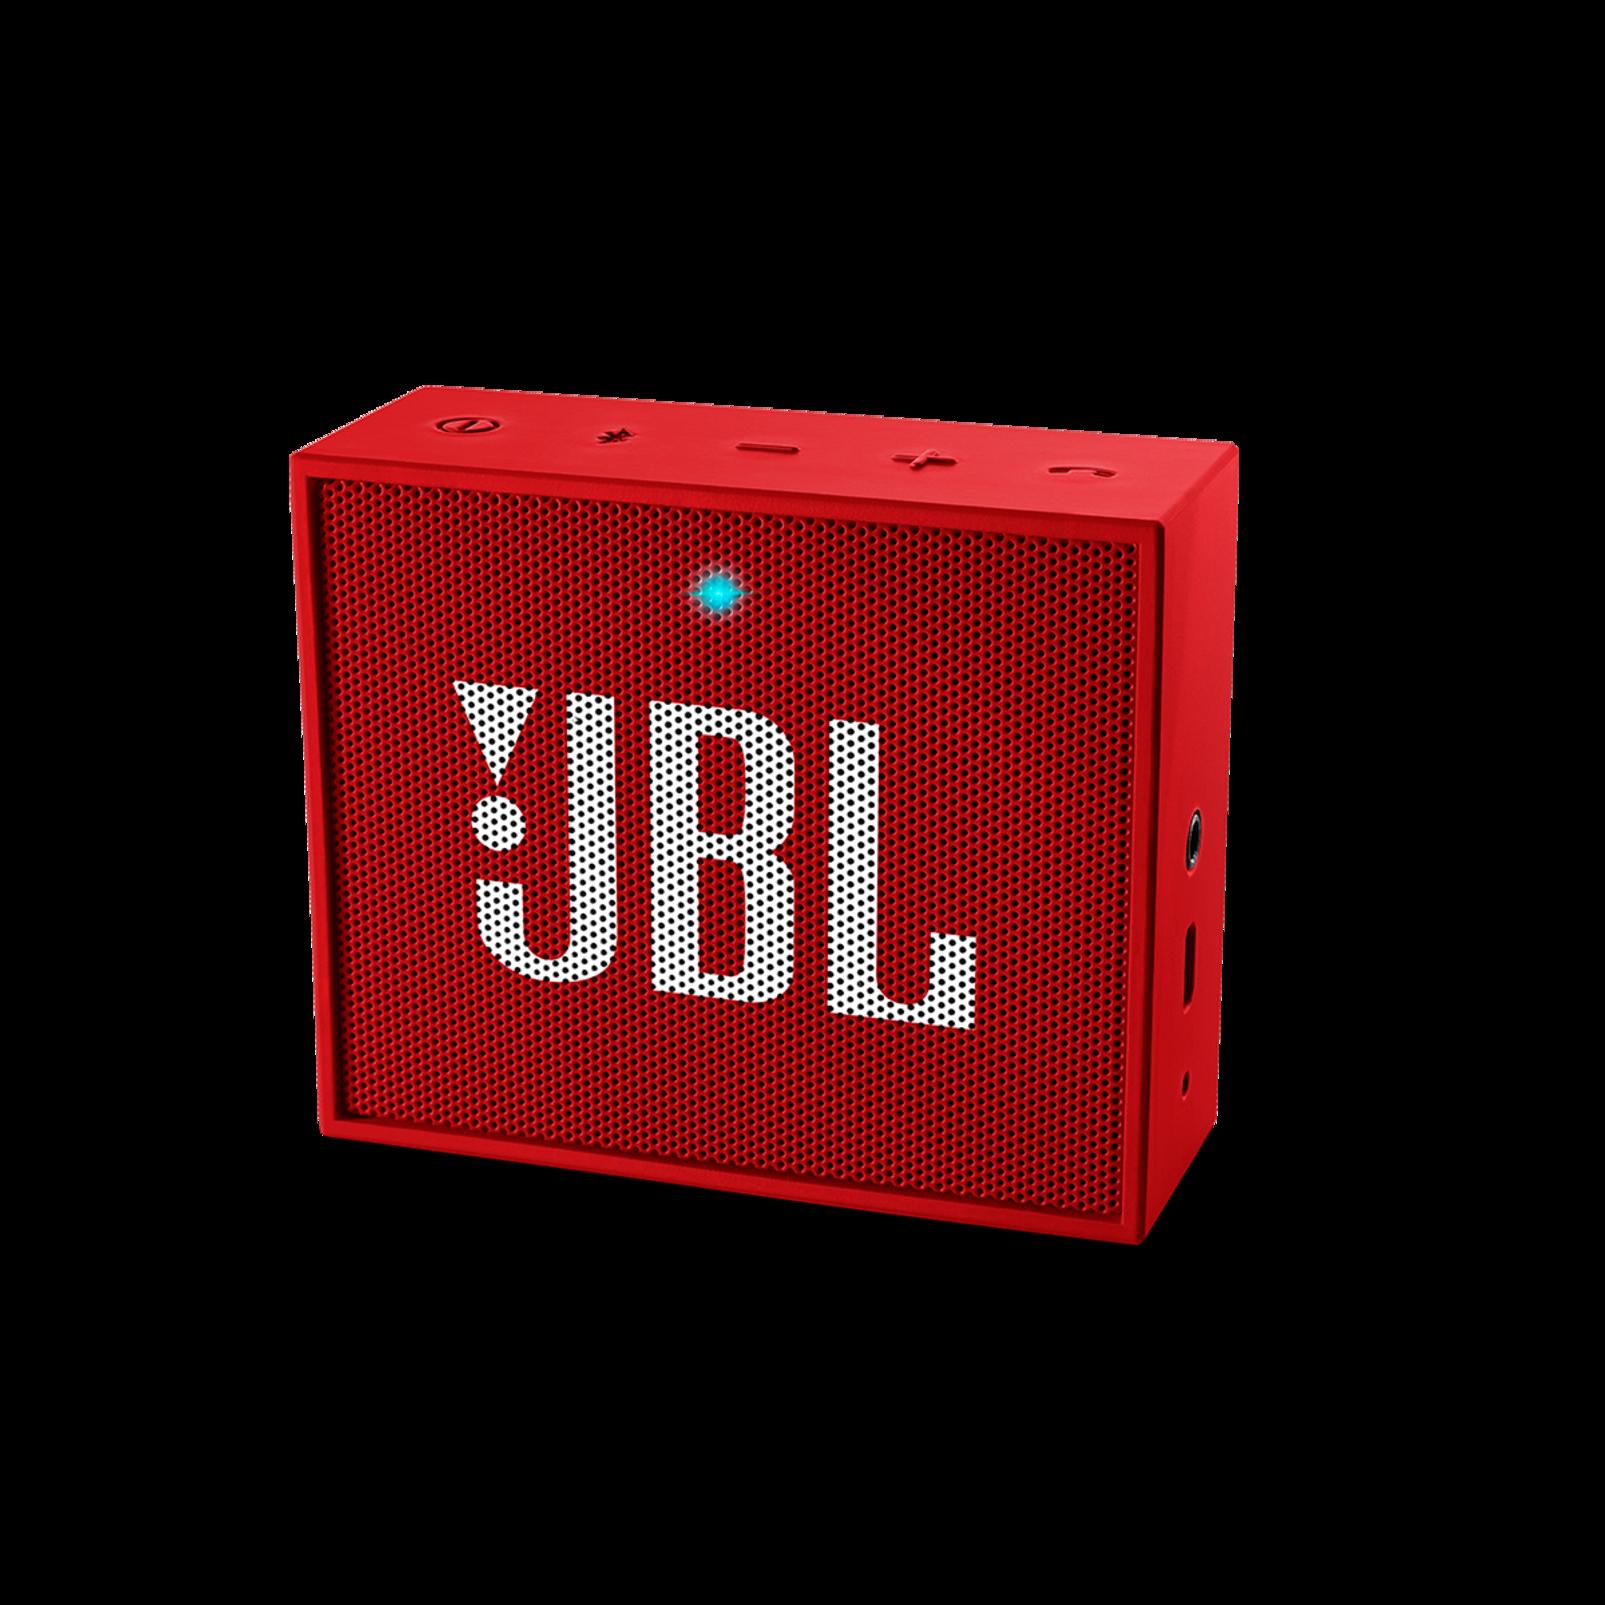 JBL GO - Red - Full-featured, great-sounding, great-value portable speaker - Hero